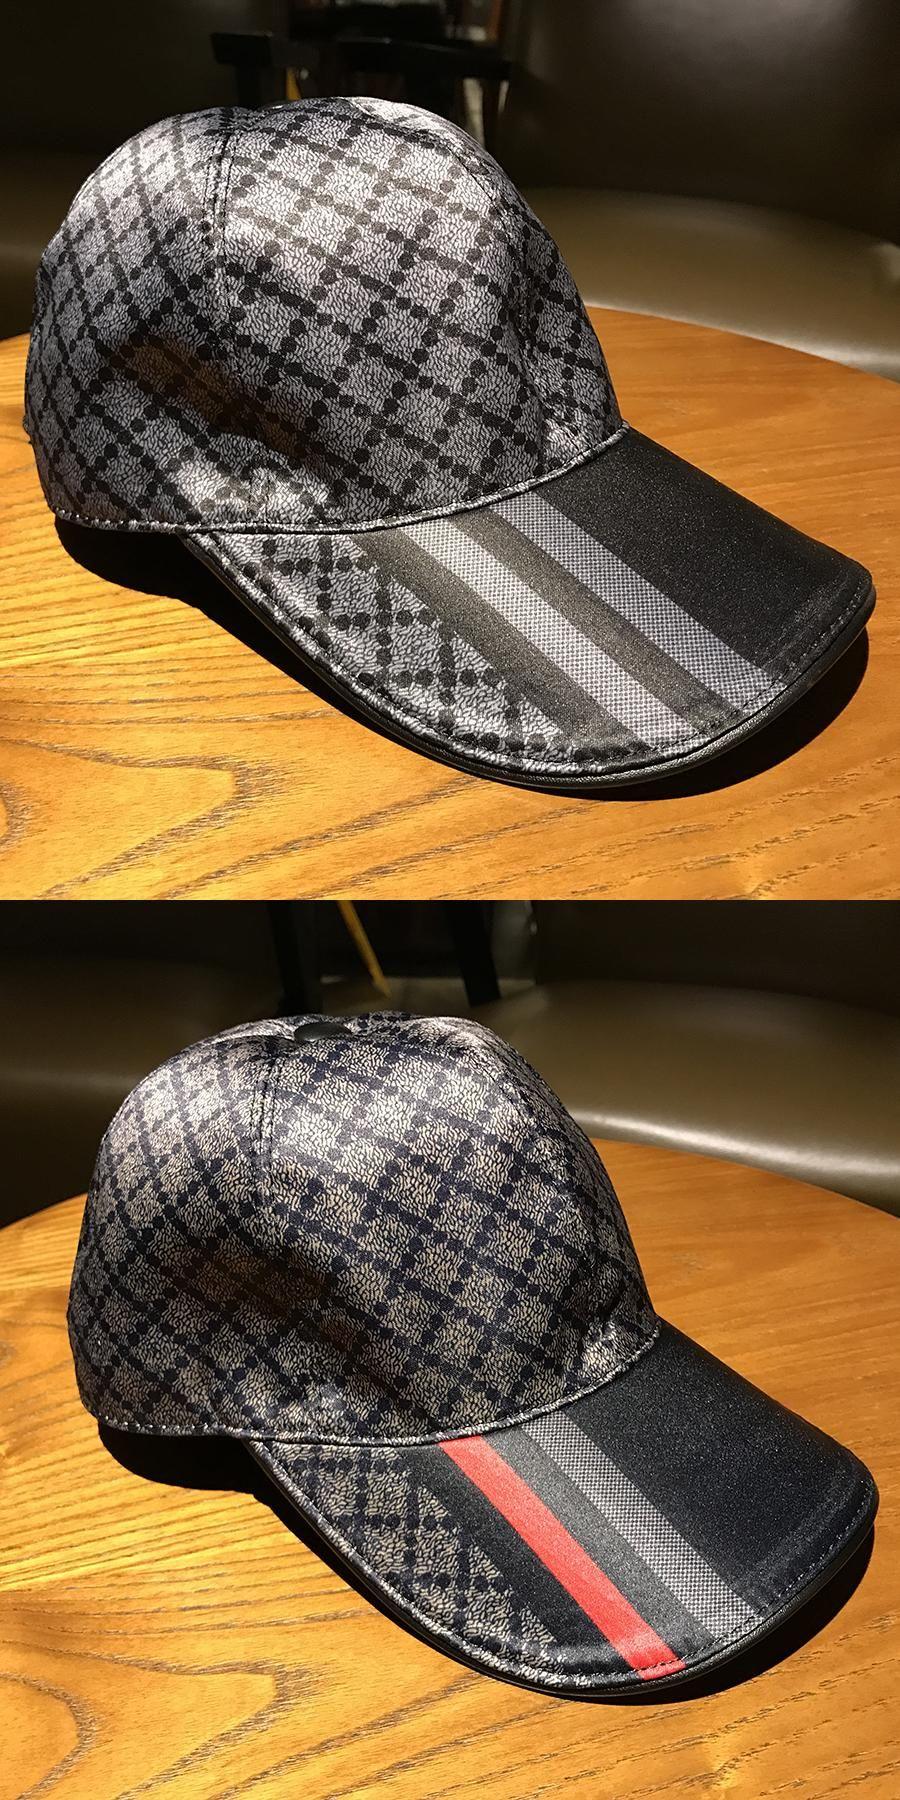 New Wholesale Baseball Cap Women Men Fashion Sport Plaid Desig Outdoor  Travel Sun Hat design Luxury 91dd76bddde